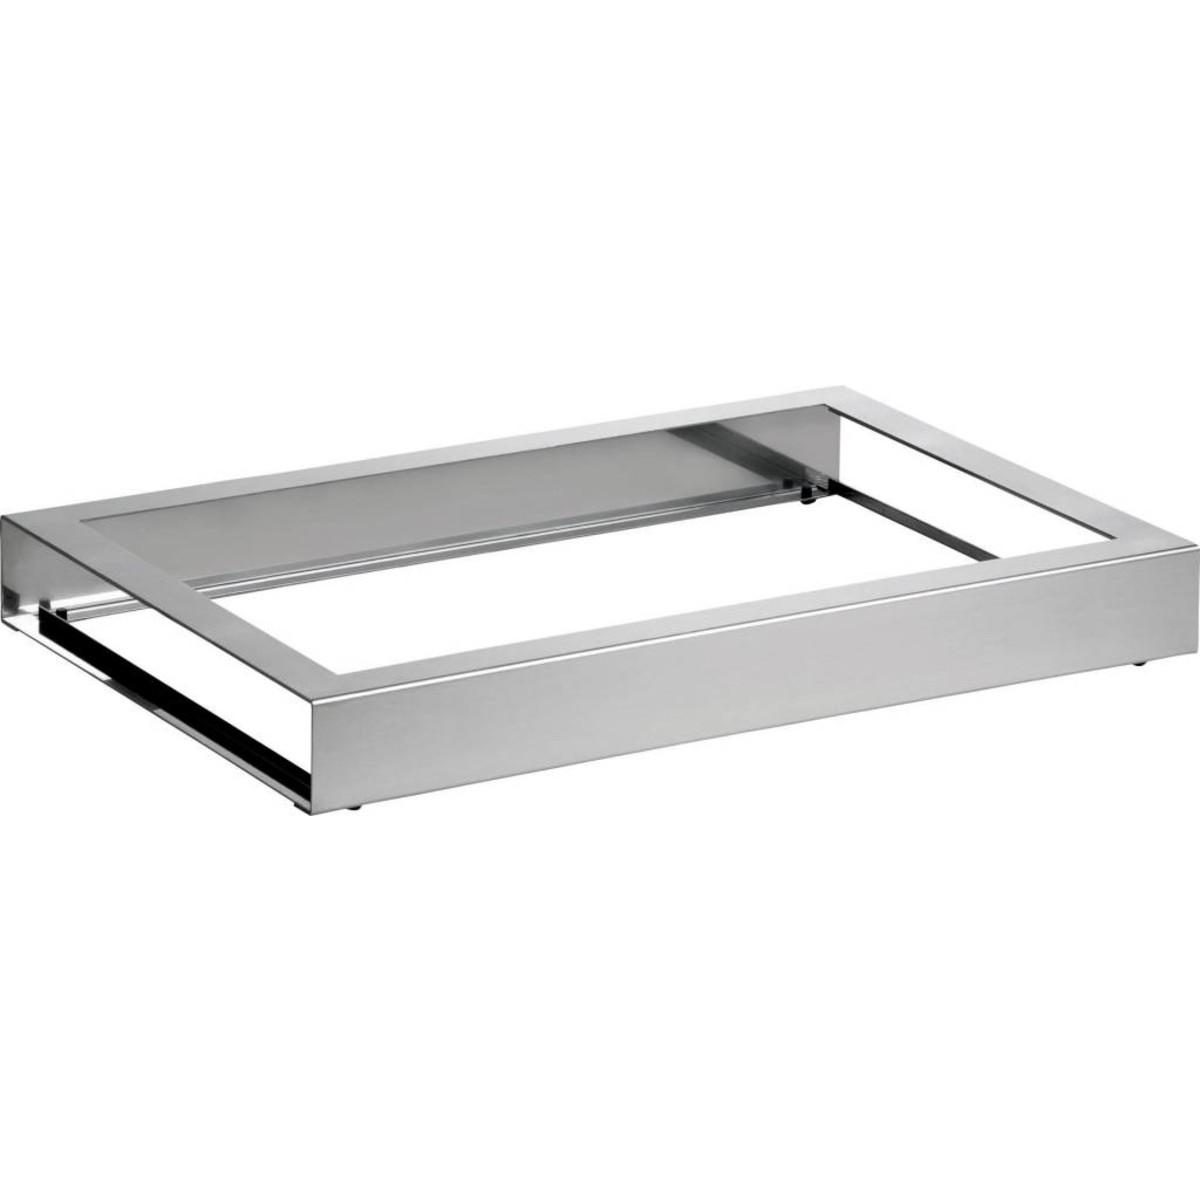 Buffetsystem Rahmen 6,5cm